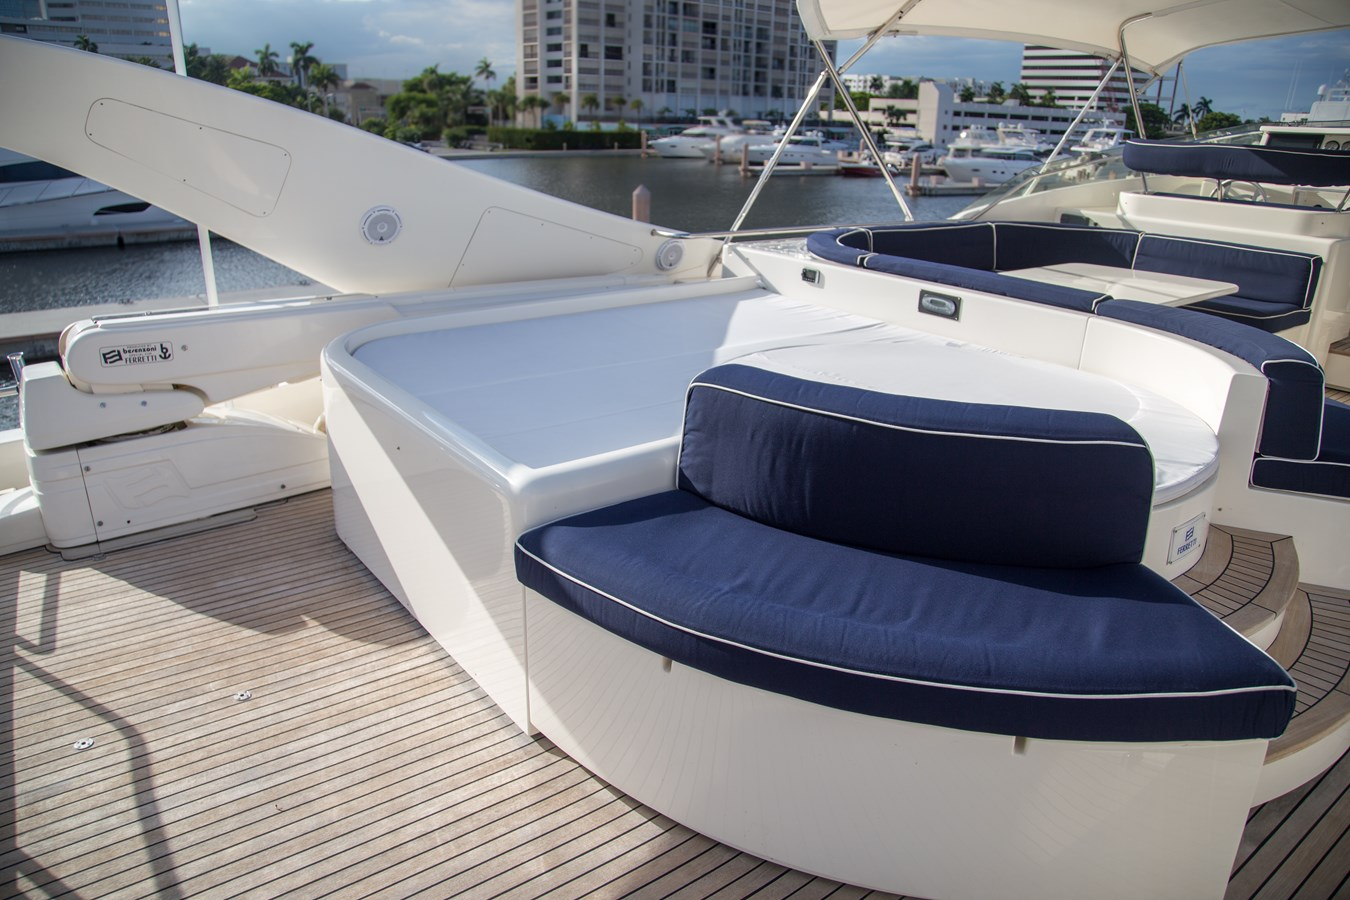 Sunpad with Jacuzzi Tub and Seating  2003 FERRETTI YACHTS Custom Flybridge Motor Yacht 2710345